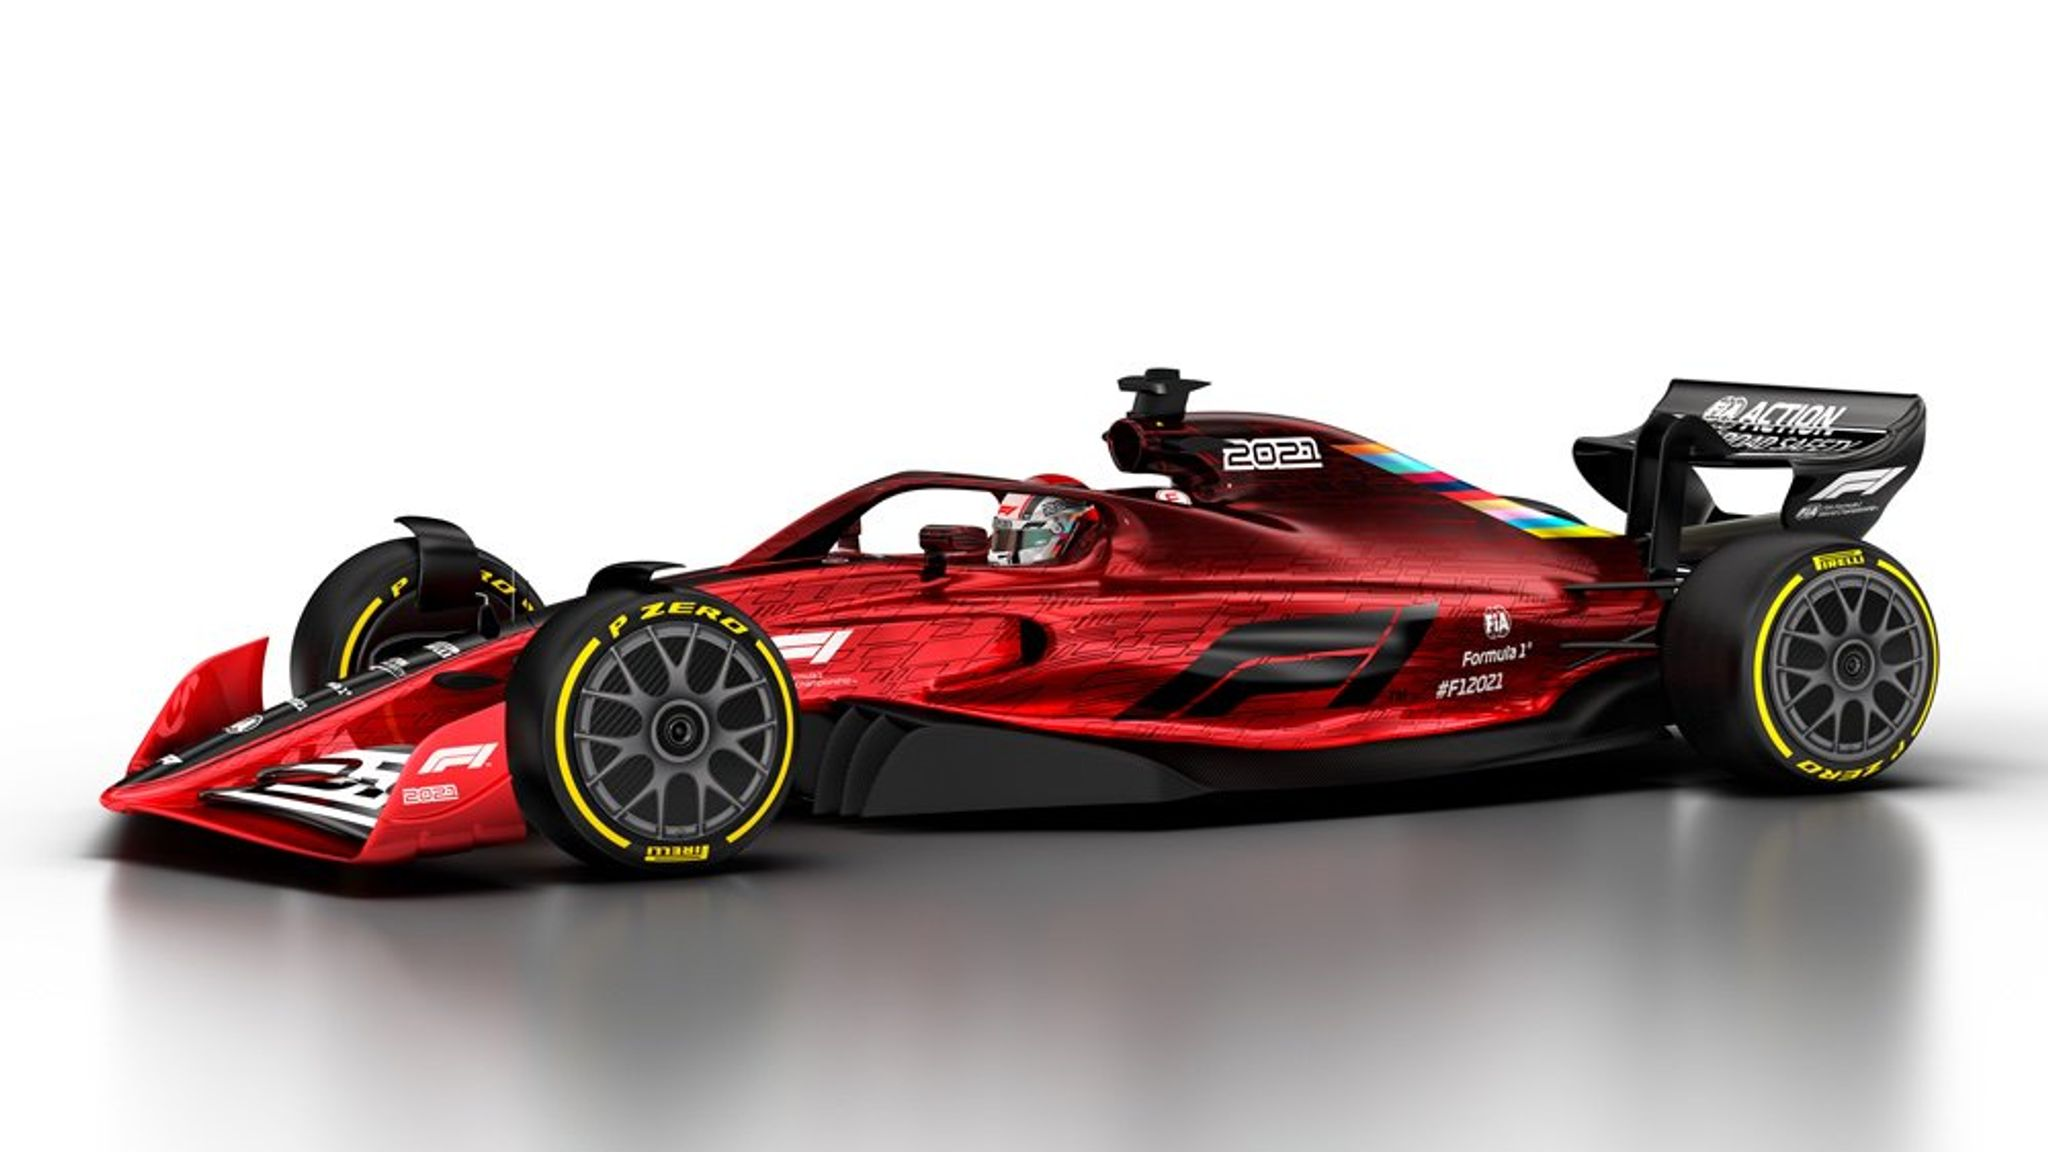 F1 2021 Rules Revealed New Cars And New Racing Headline Major Overhaul F1 News